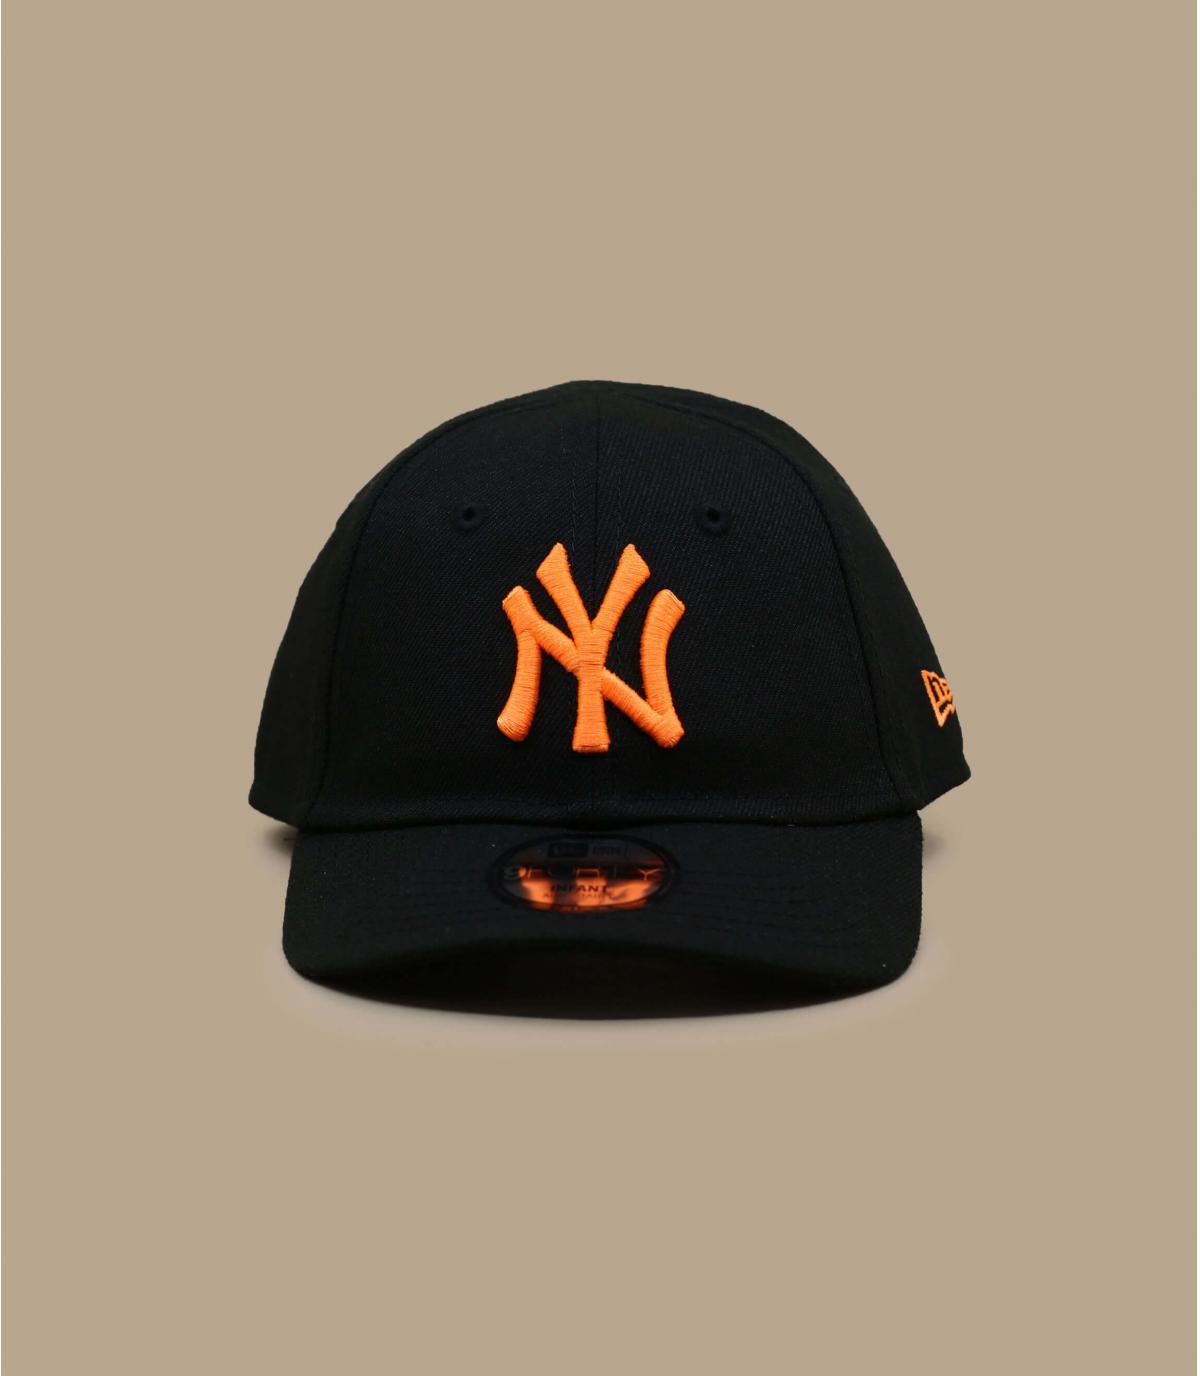 NY baby cap black orange